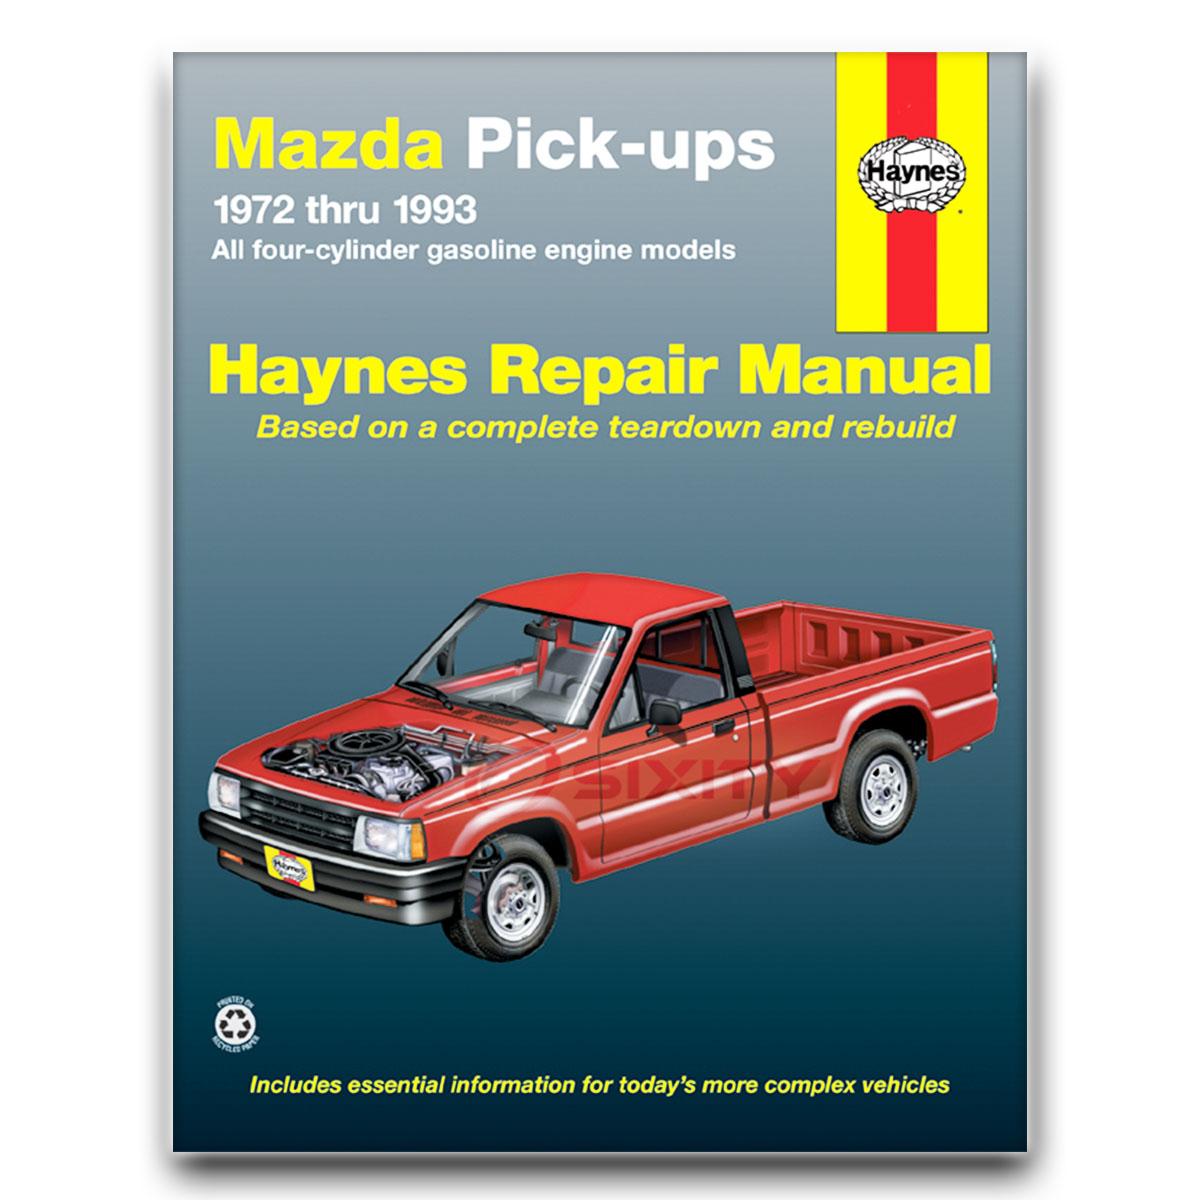 mazda b1600 haynes repair manual base shop service garage book mc ebay rh ebay com Mazda B2600i mazda b1600 workshop manual pdf